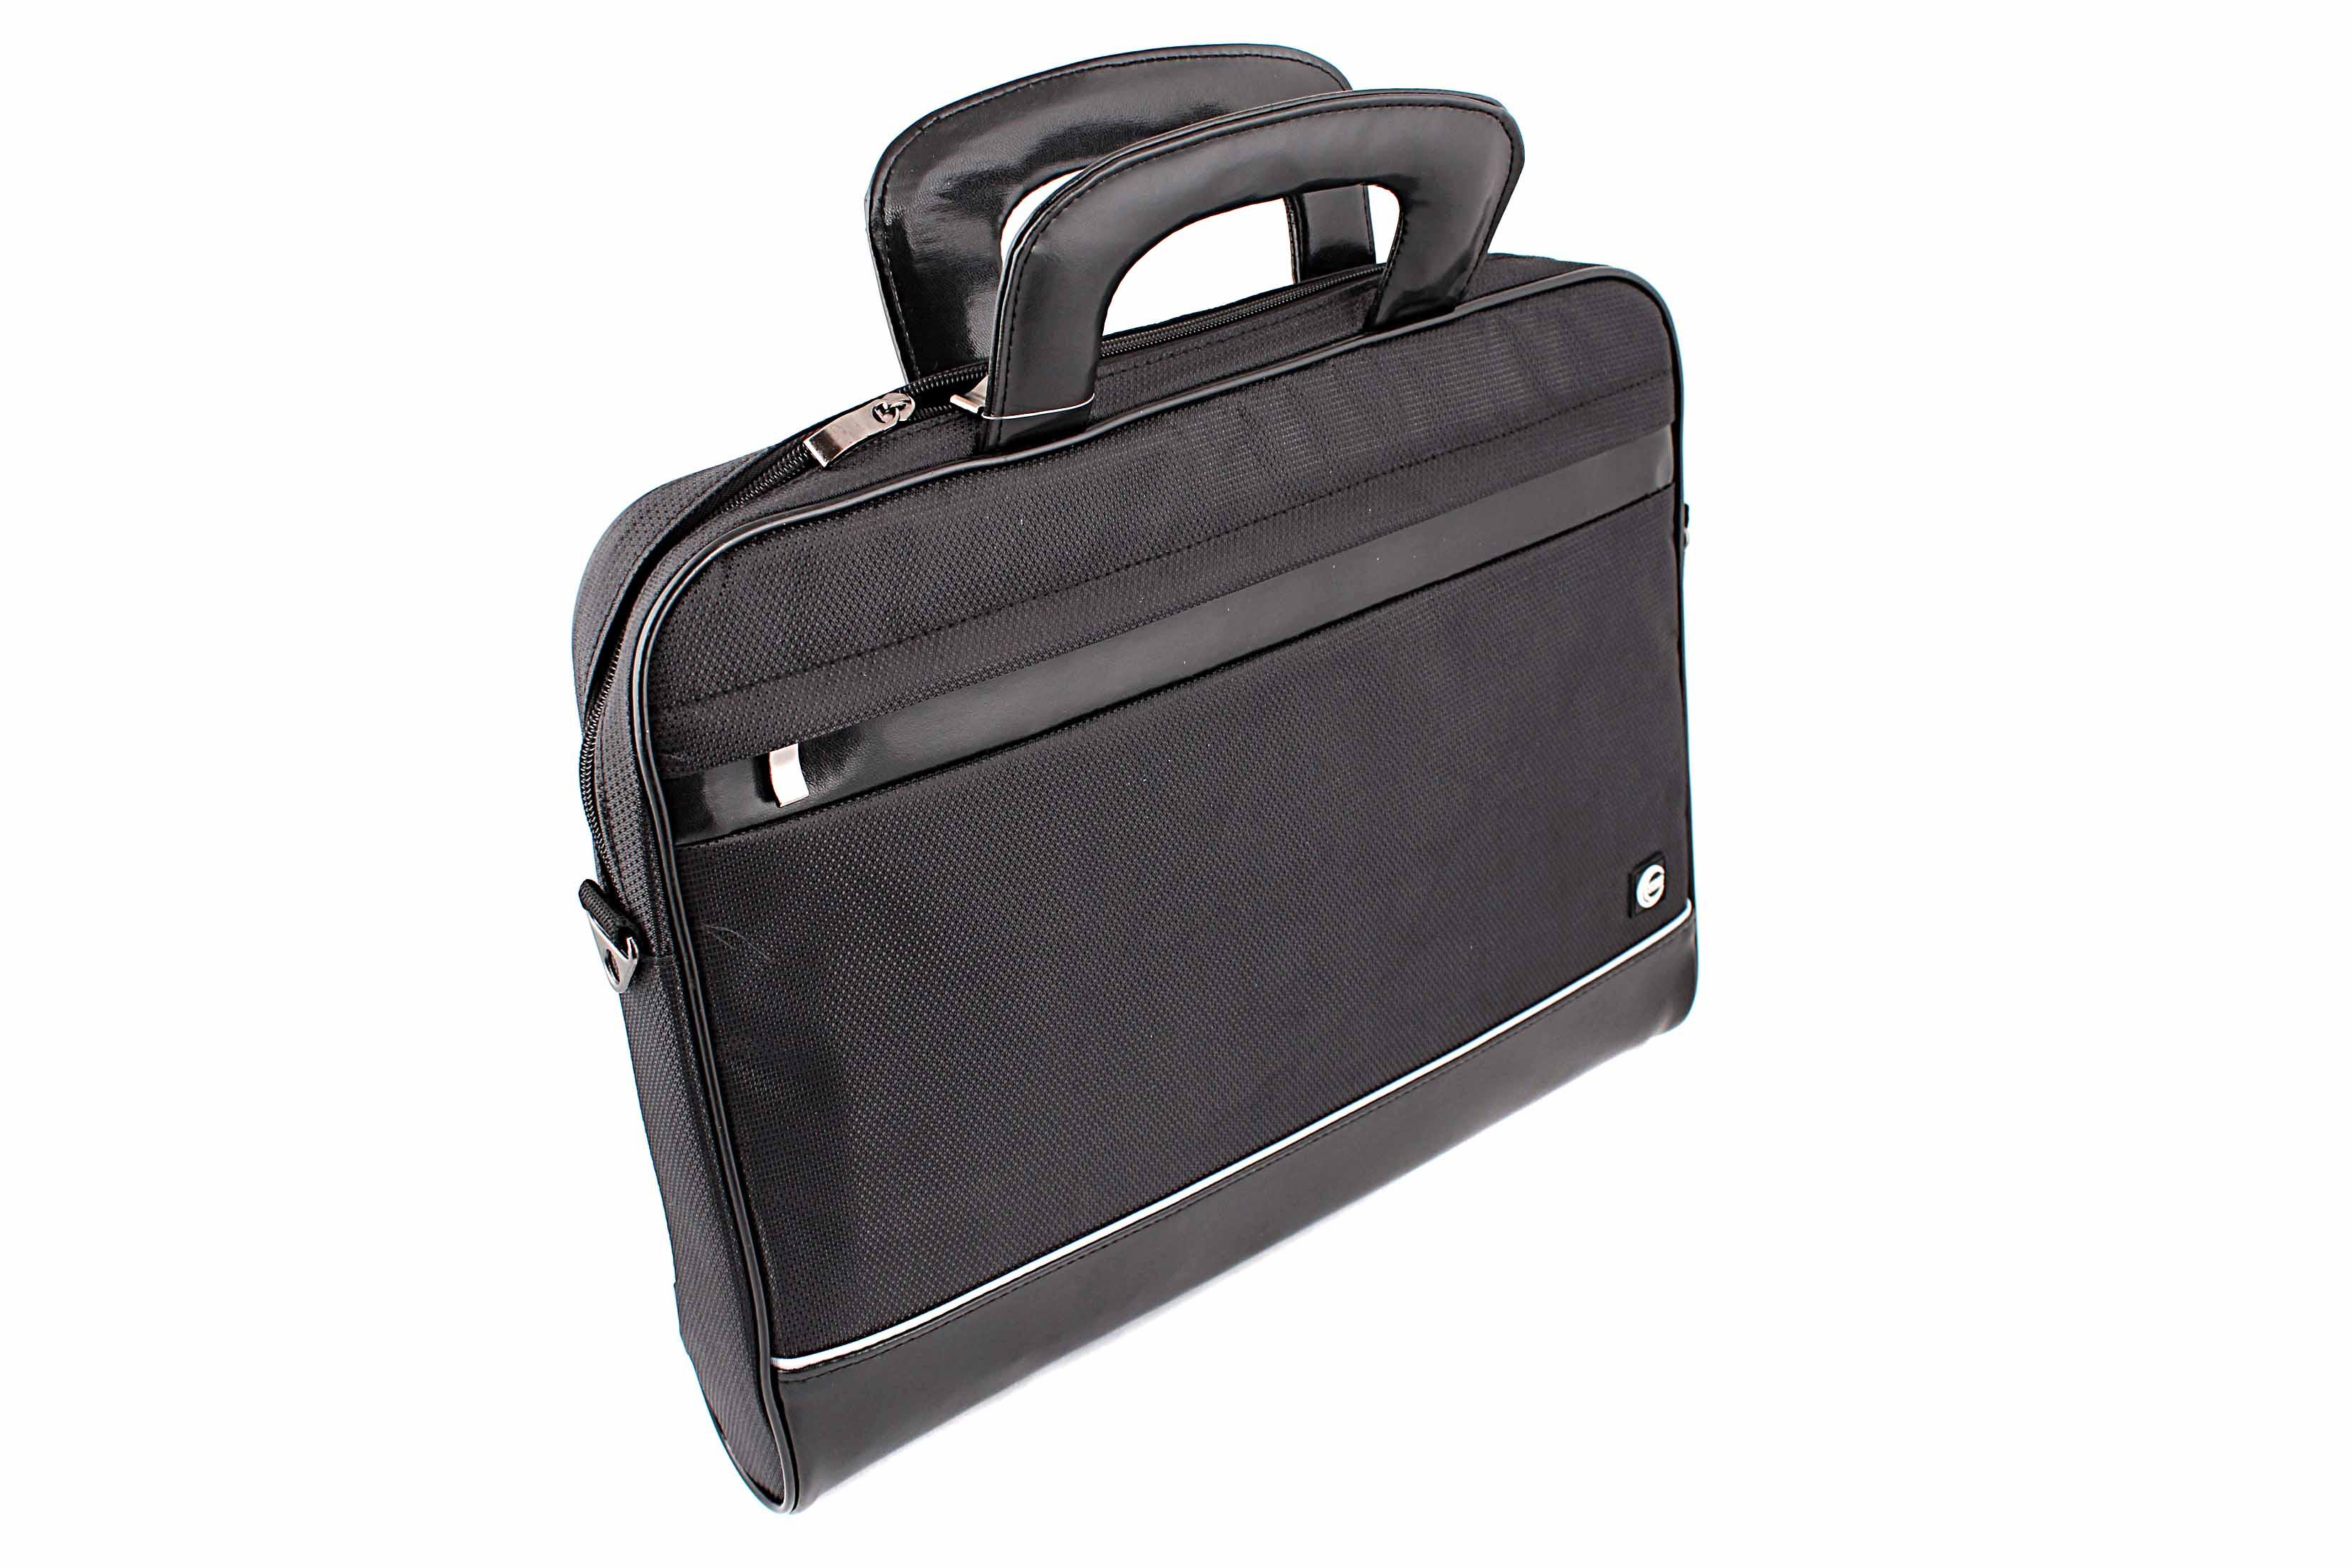 Кейс для ноутбука Cross case Real Brand Technics 899.000